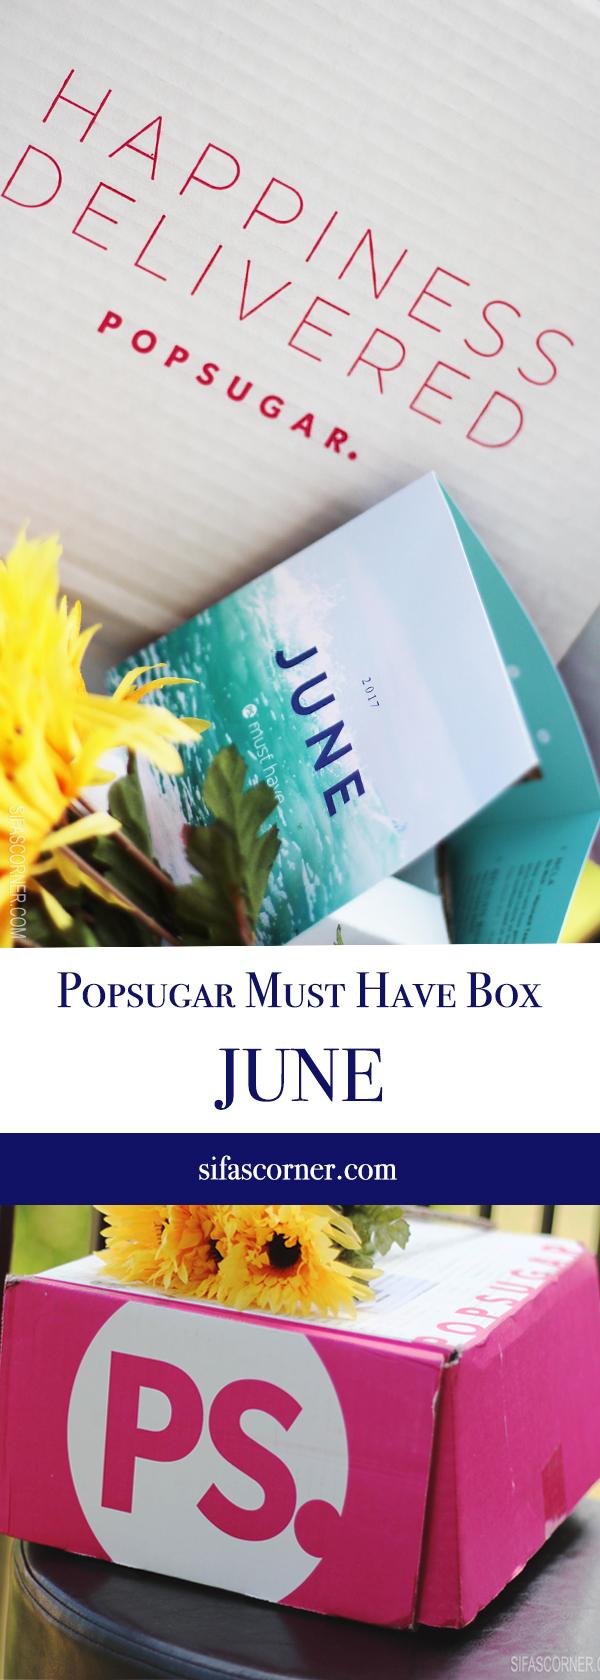 June 2017 POPSUGAR Must Have Box